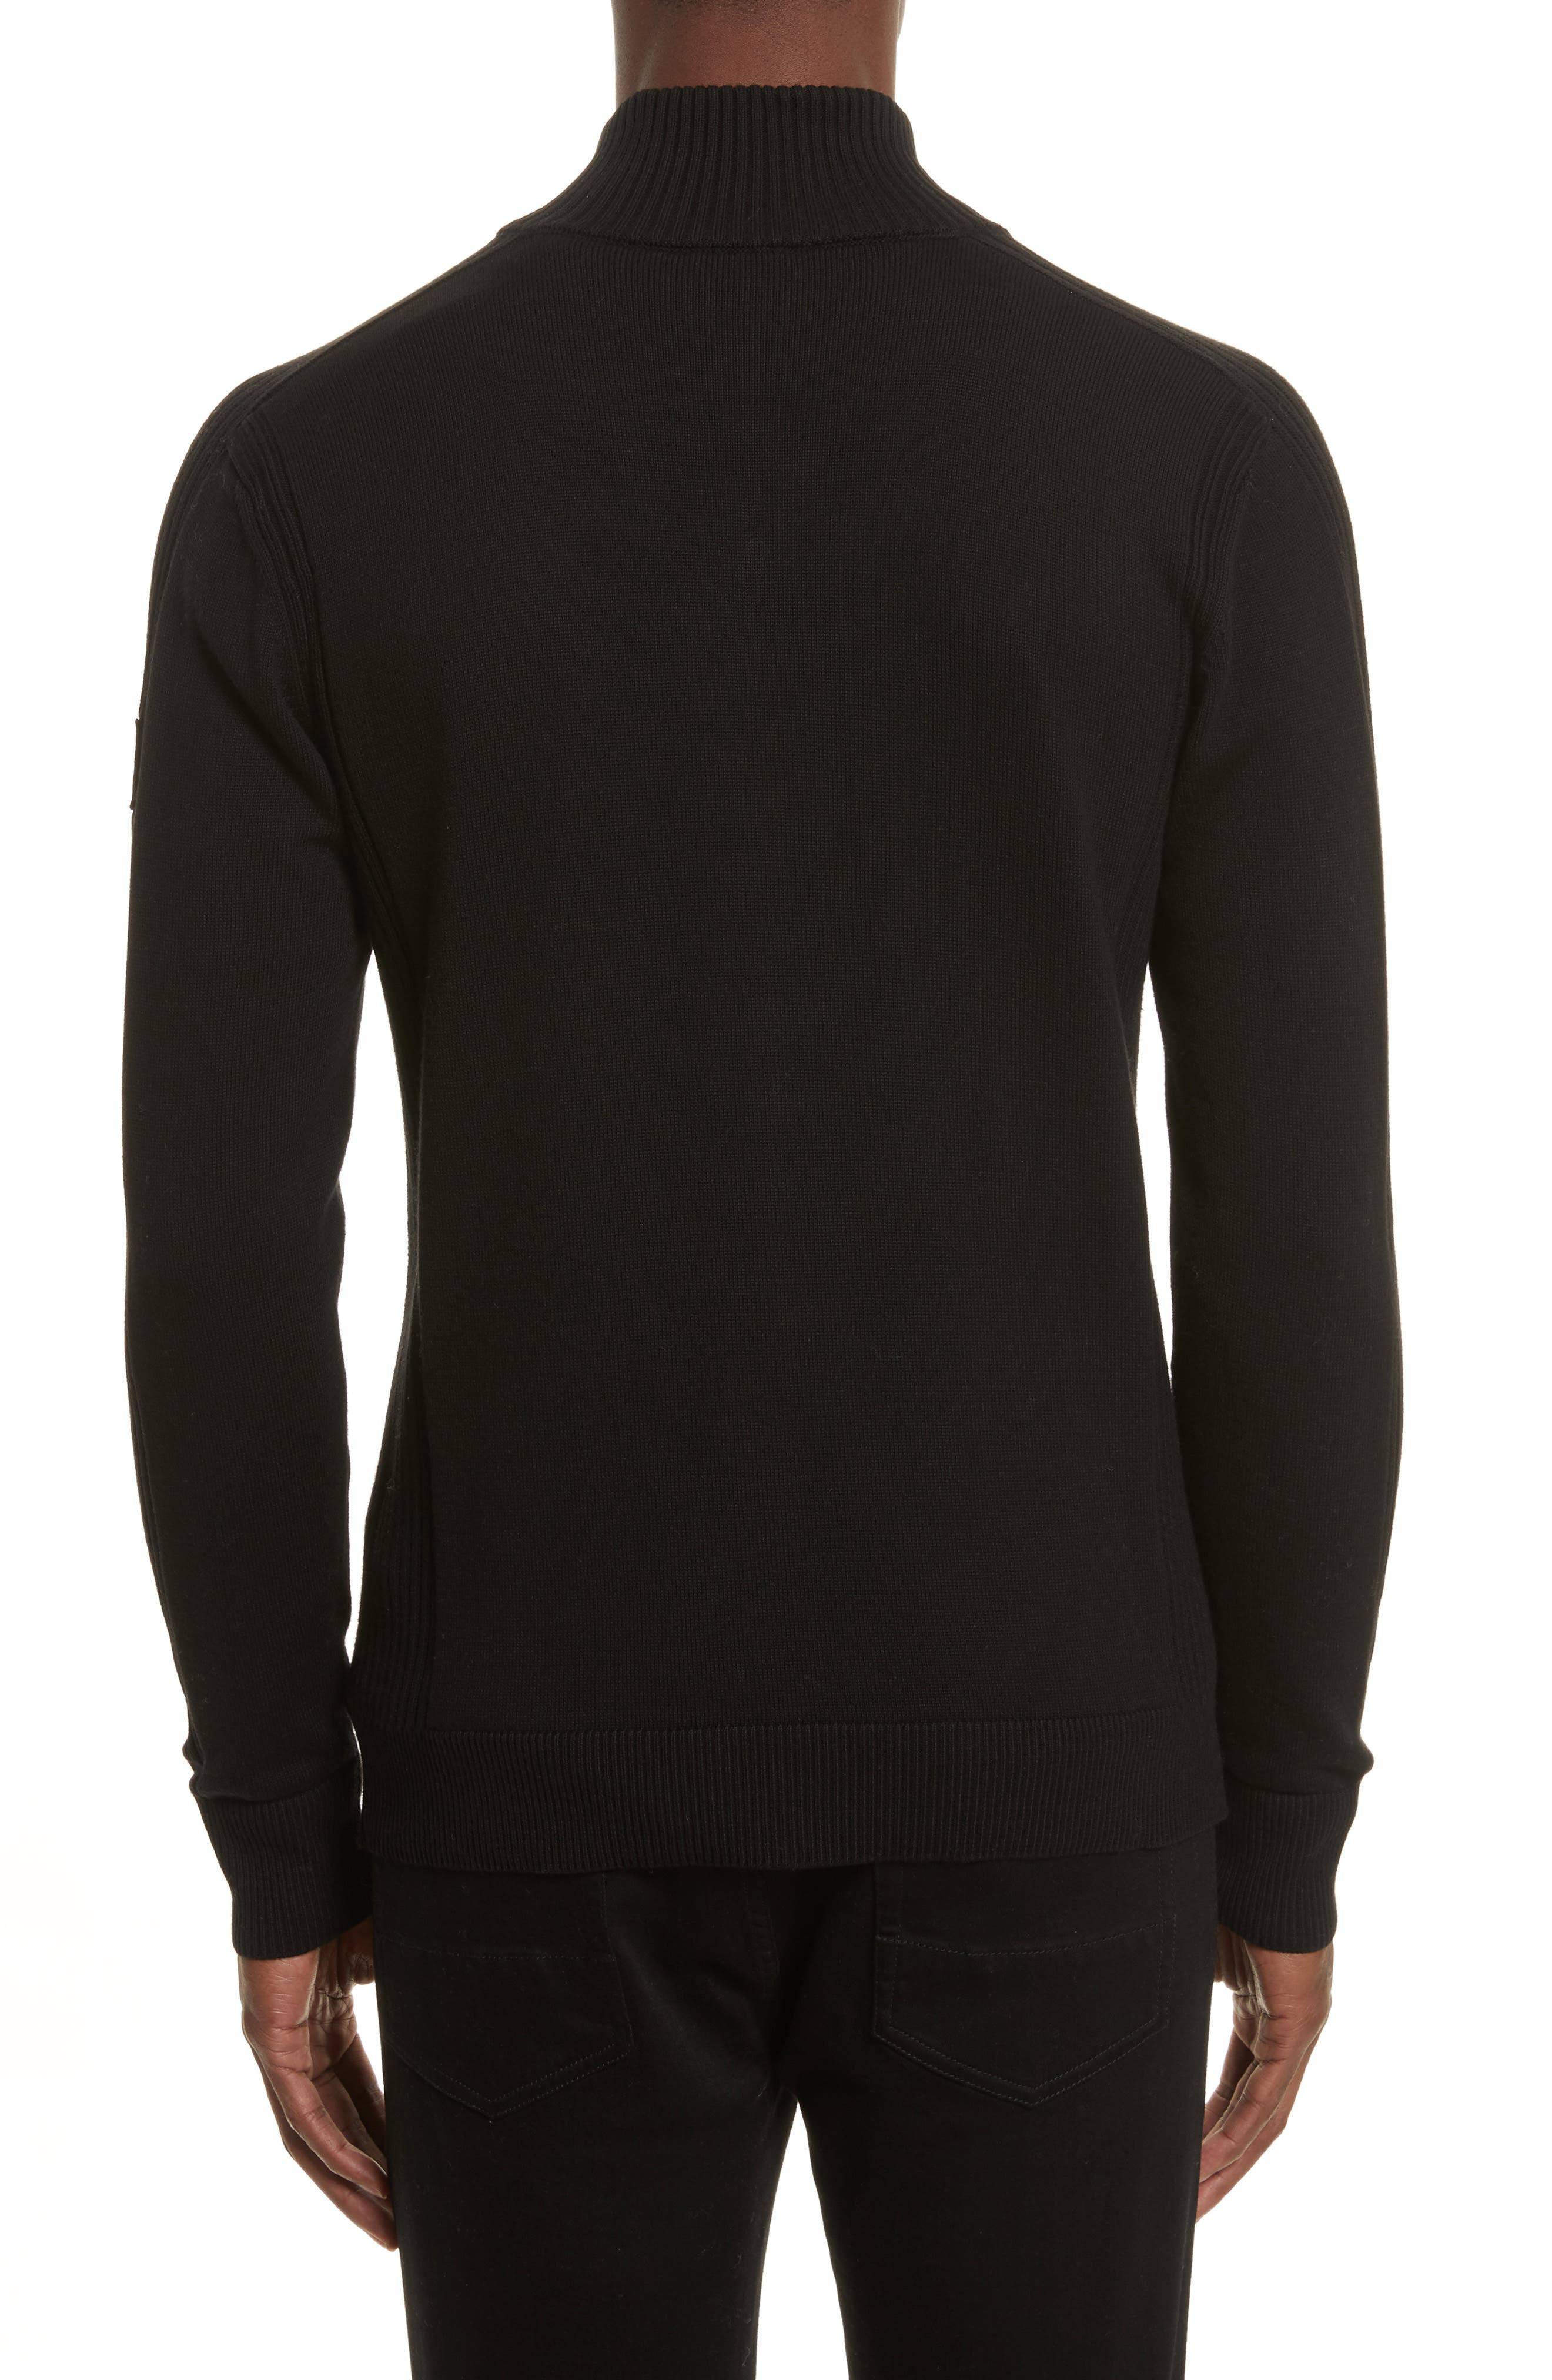 Allerford Knit Cotton Jacket,                             Alternate thumbnail 2, color,                             001